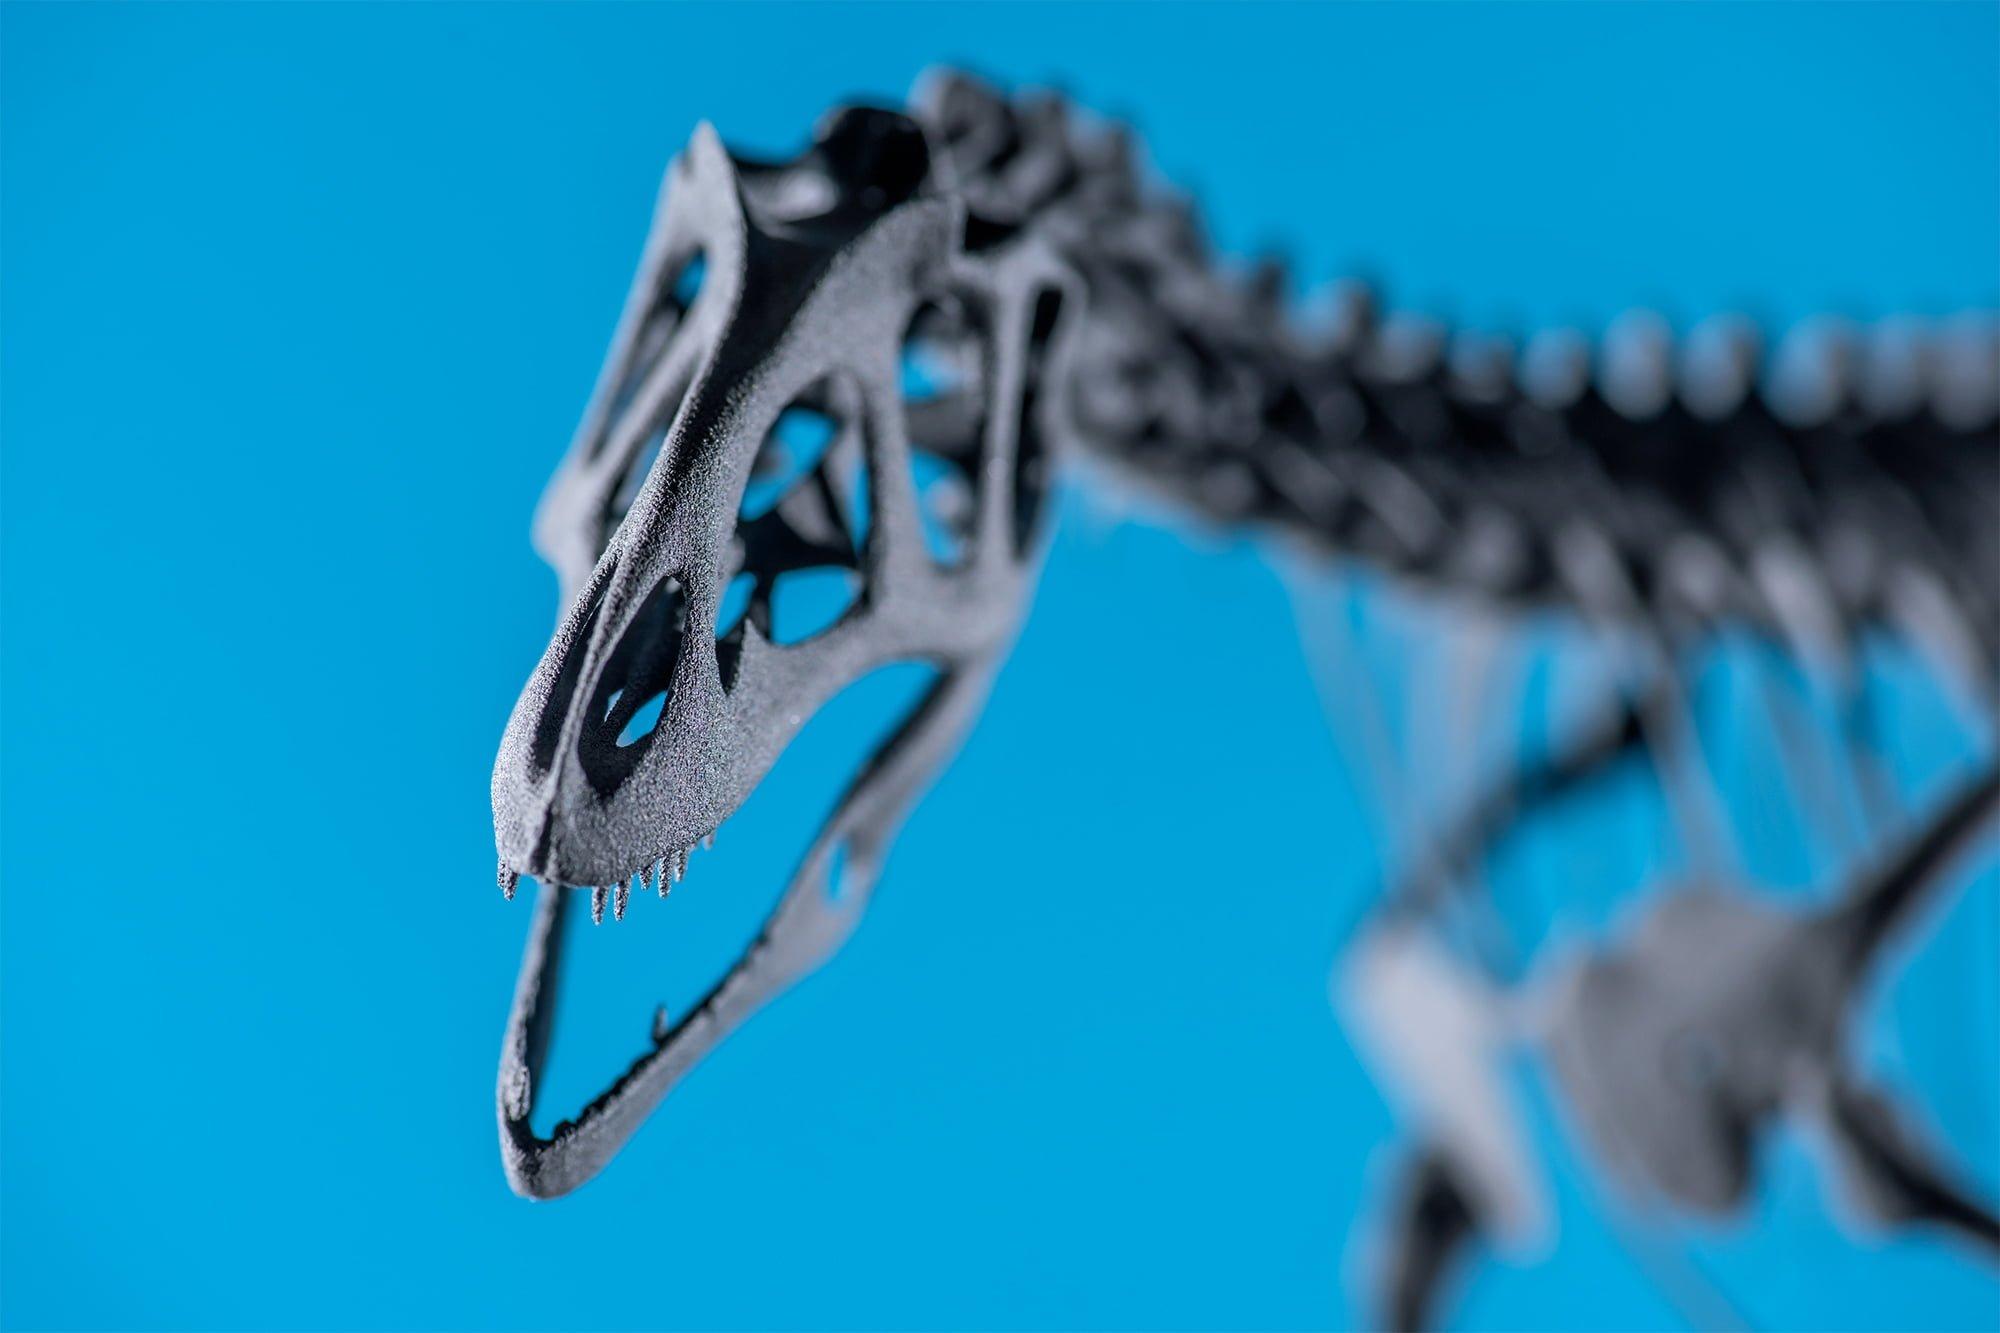 Allosaurus, sls-print, colour, zoom, sintratec, ikonaut